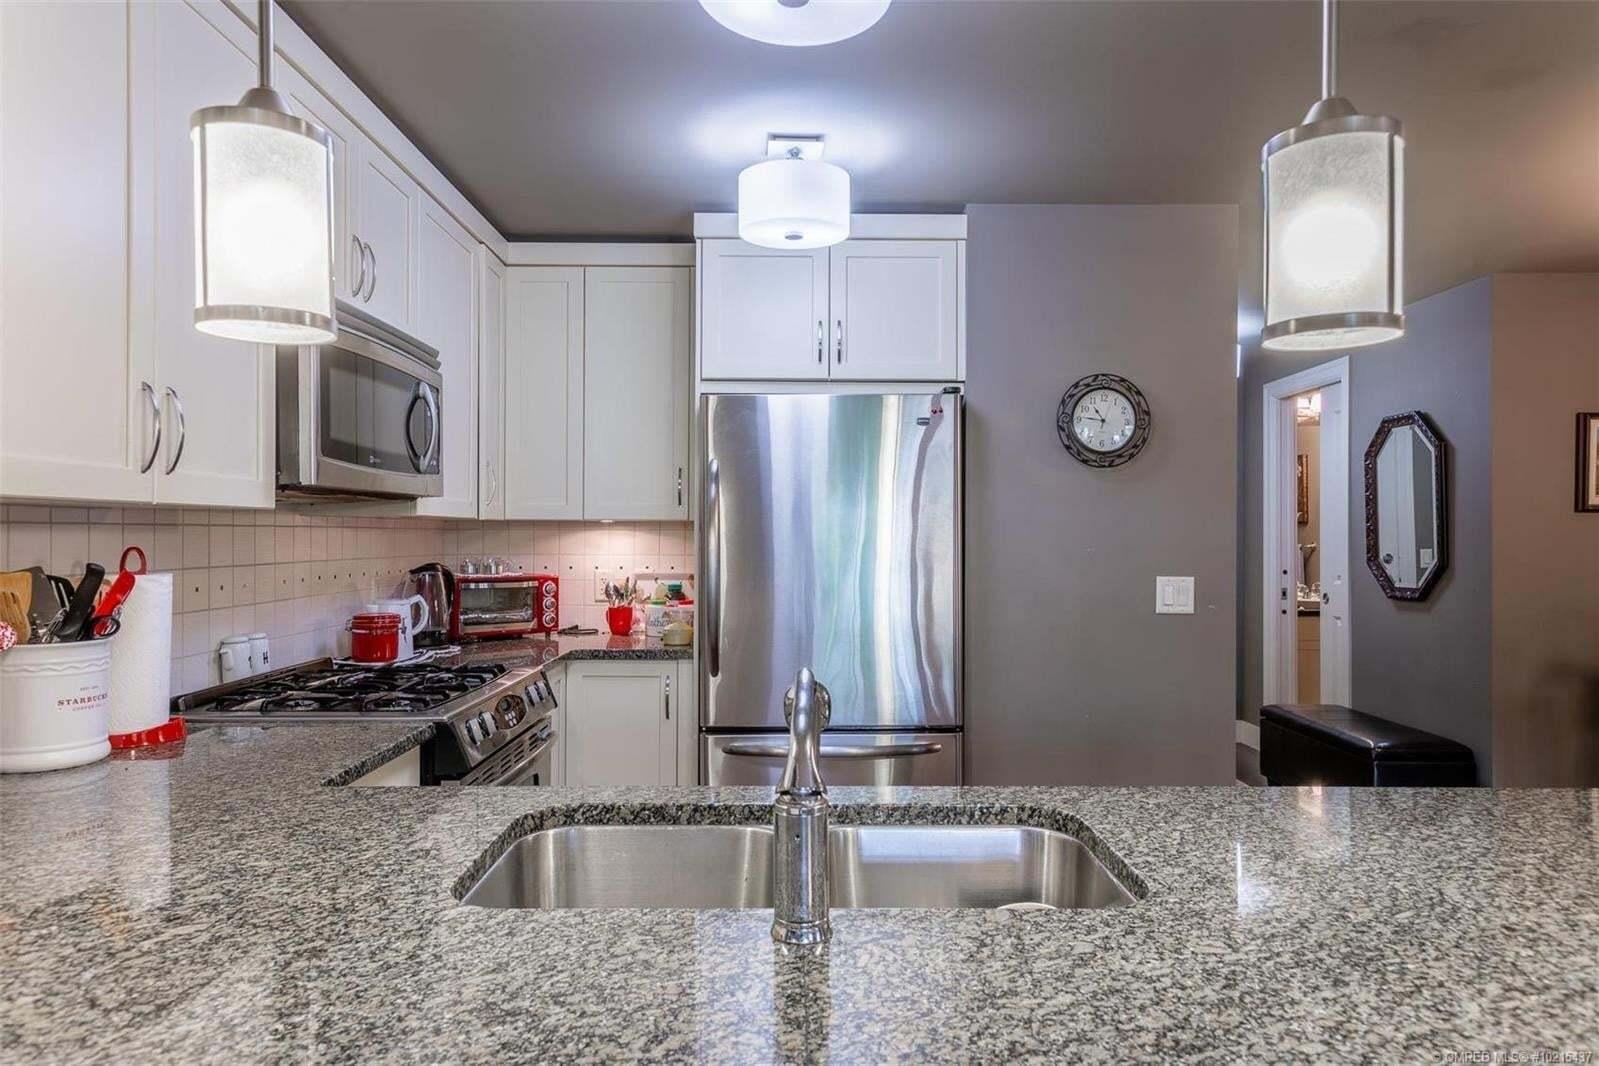 Condo for sale at 580 Sarsons Rd Kelowna British Columbia - MLS: 10215437